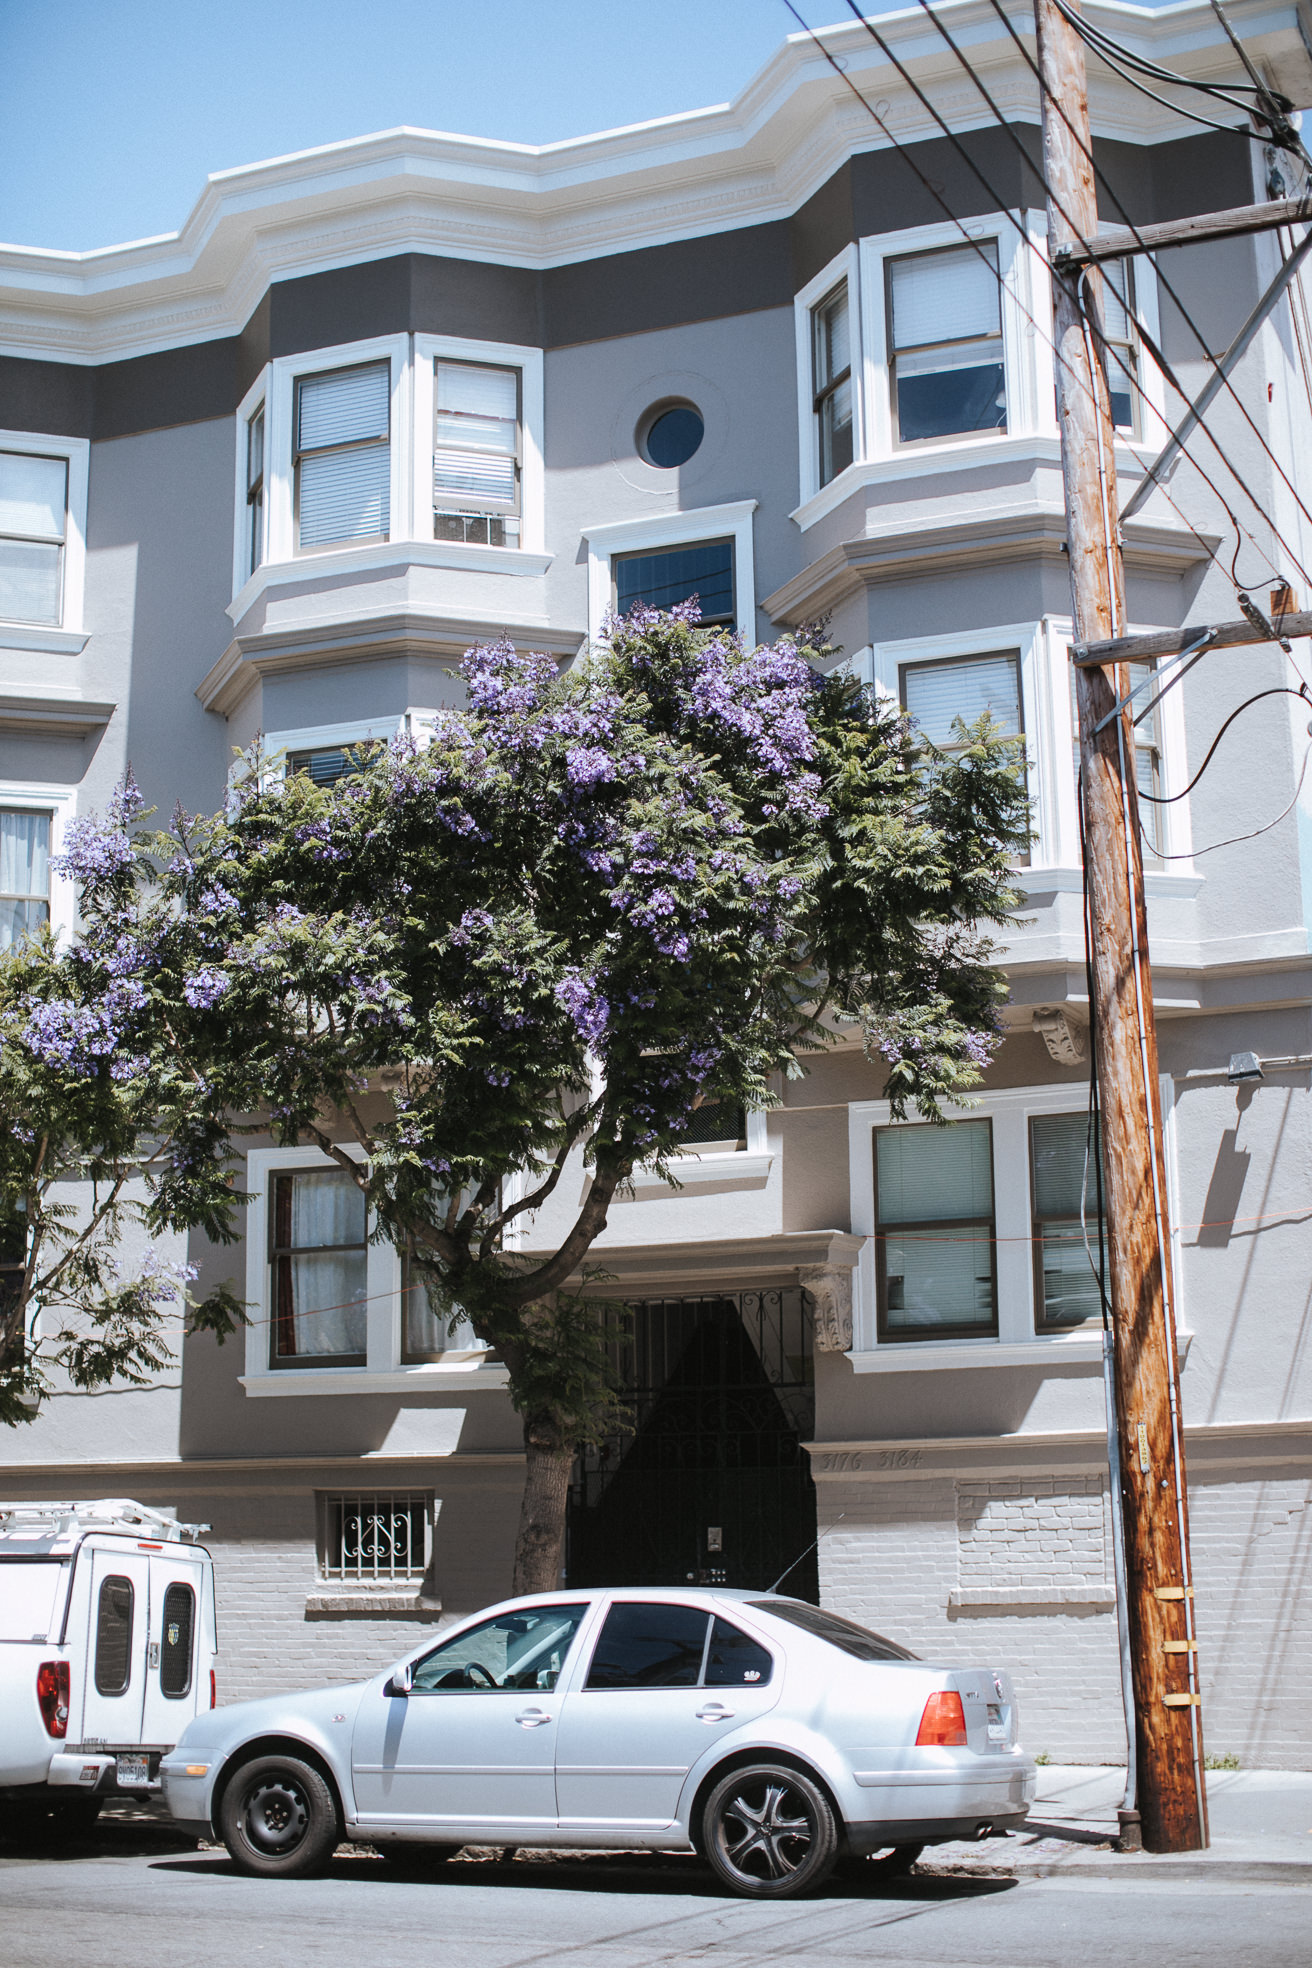 San-Francisco-BildervomLeben-4980